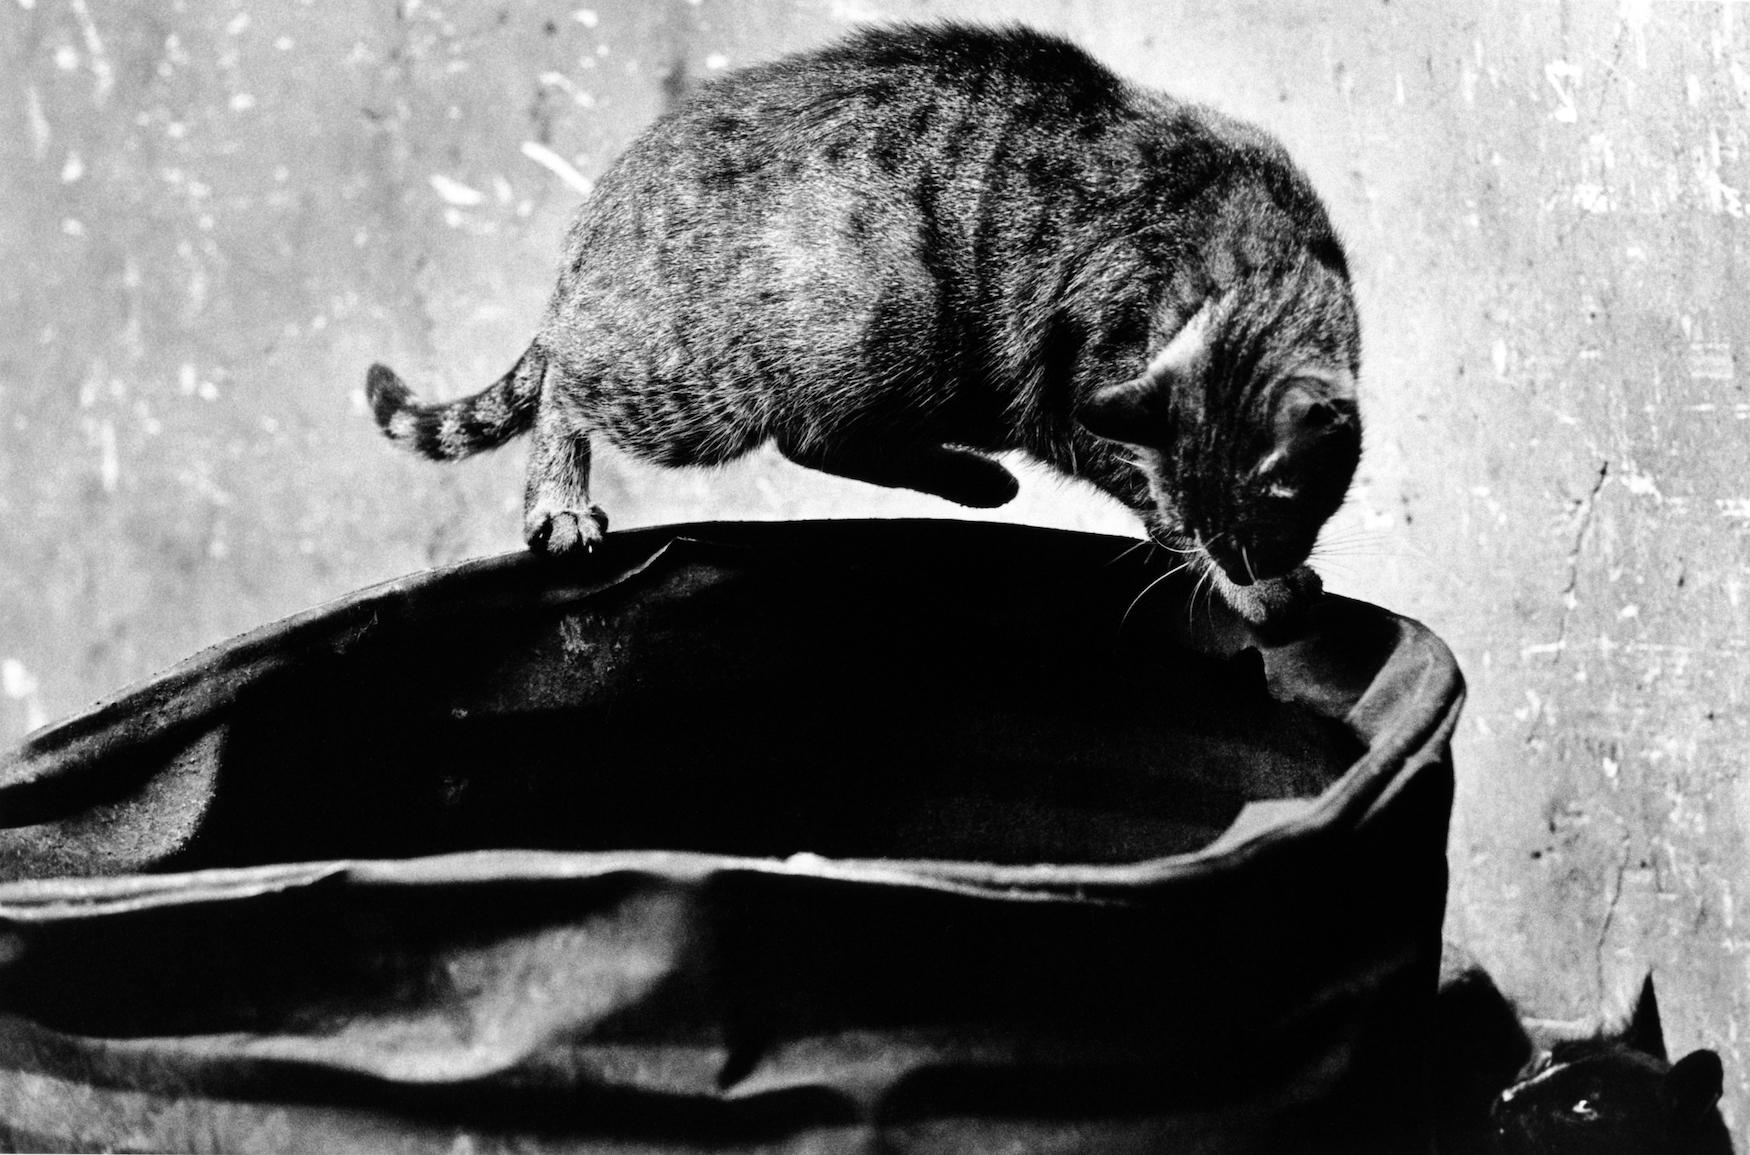 walter_rothwell_photography_cats-017.jpg